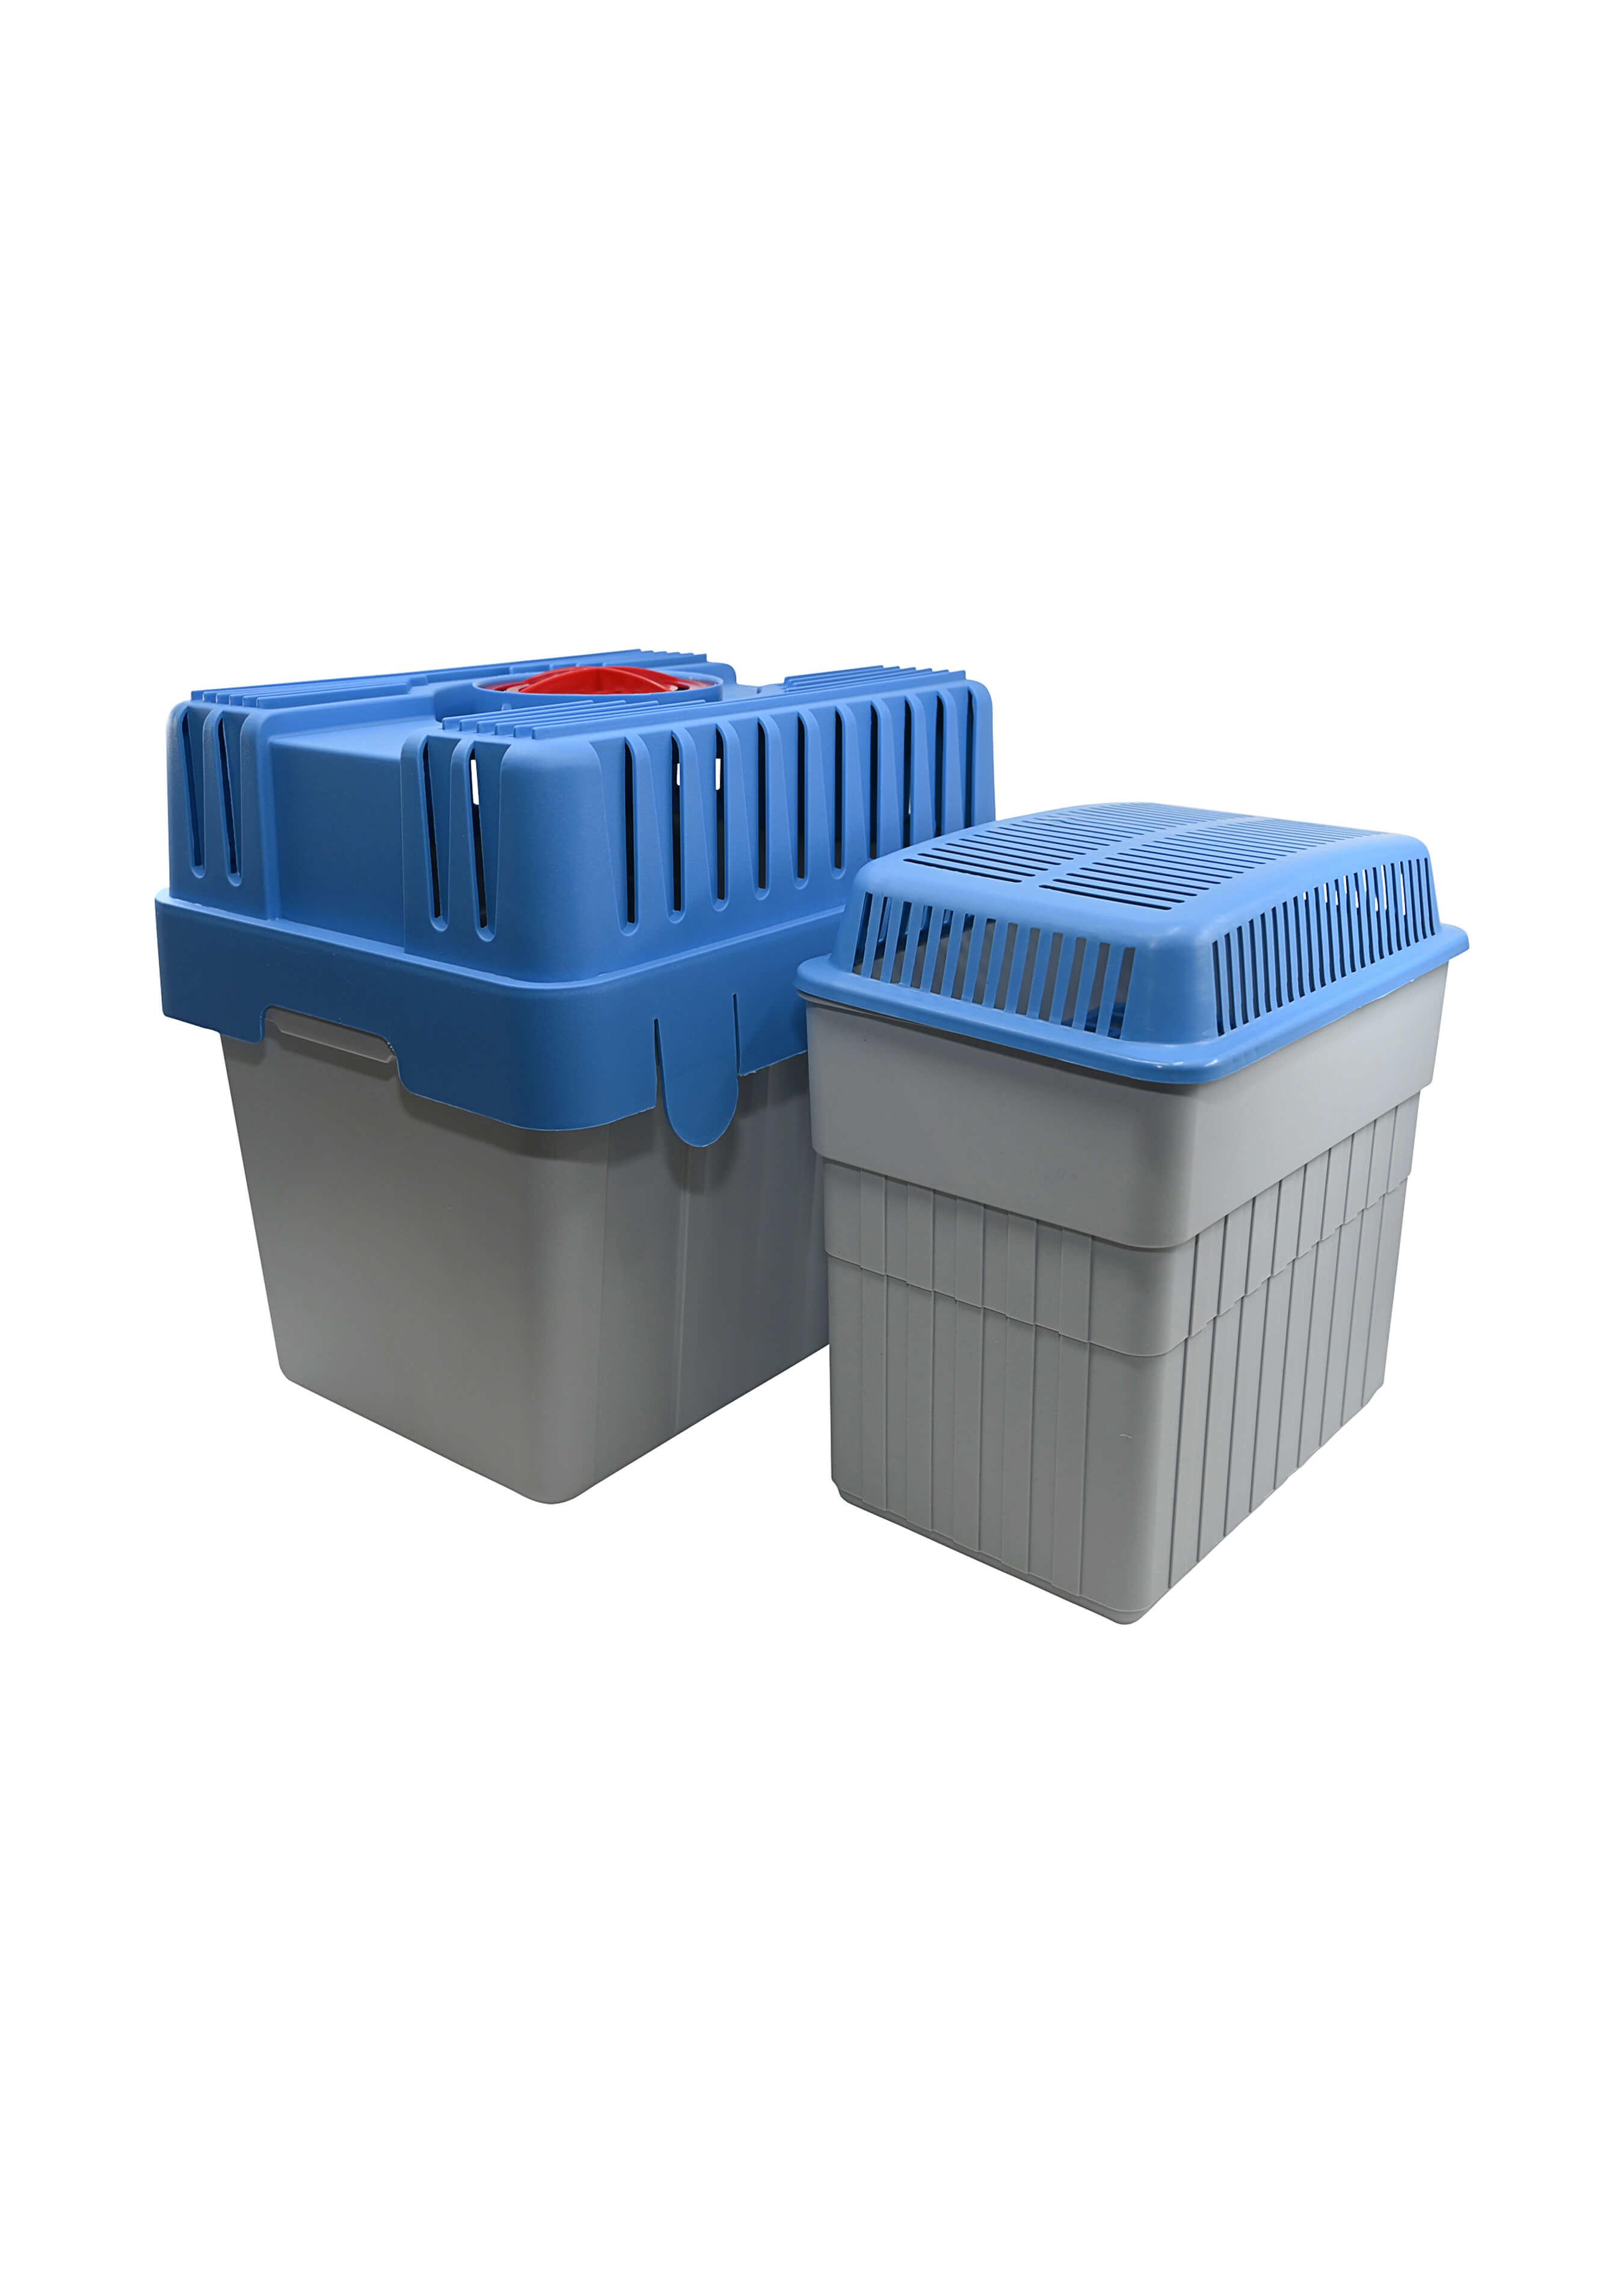 Feuchtigkeitskiller L2011 10